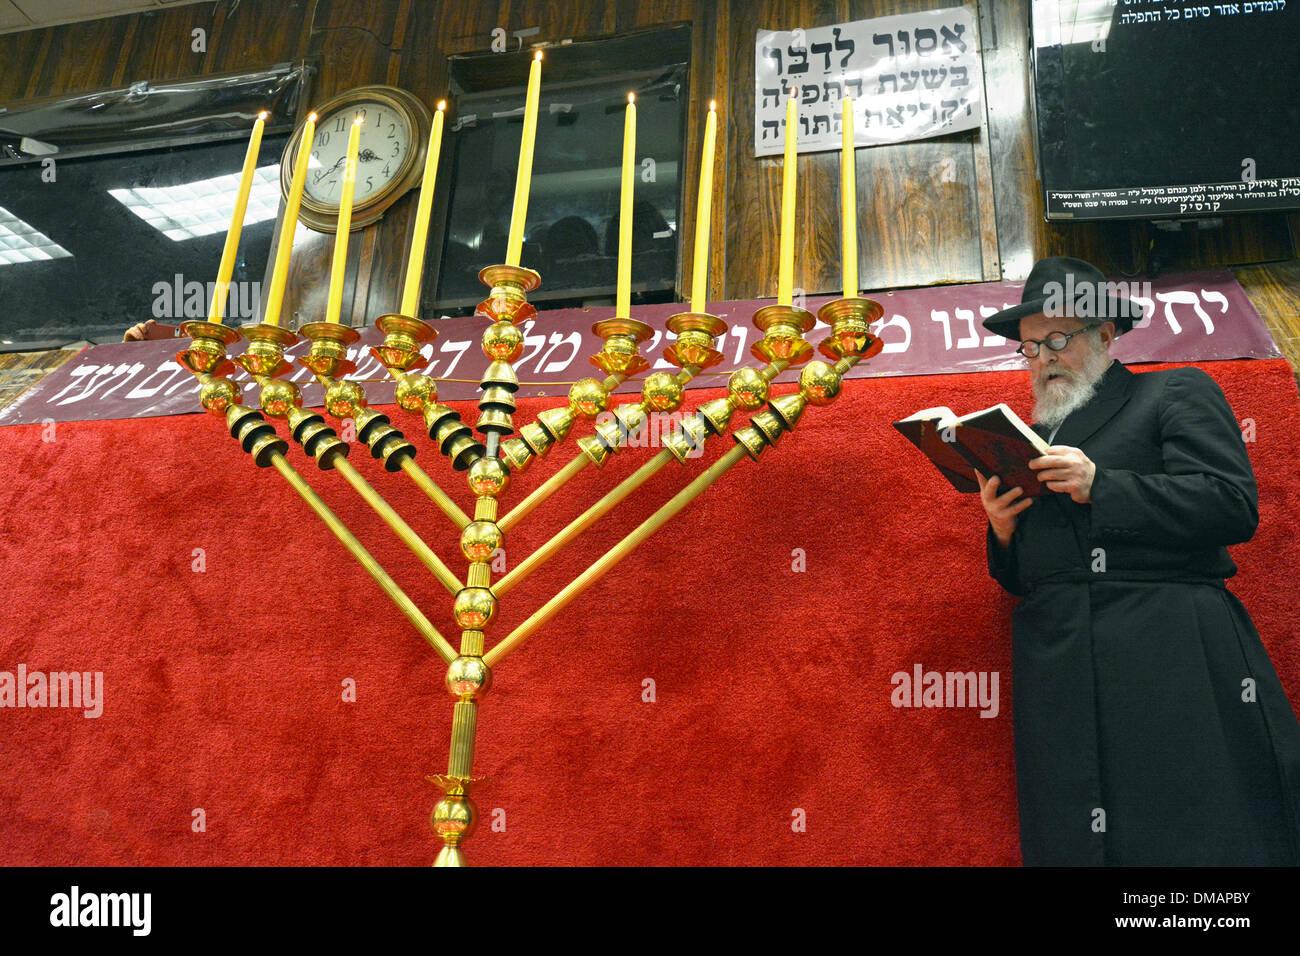 An orthodox Jewish rabbi prays after lighting Hanukkah candles at Lubavitch headquarters in Brooklyn, New York - Stock Image